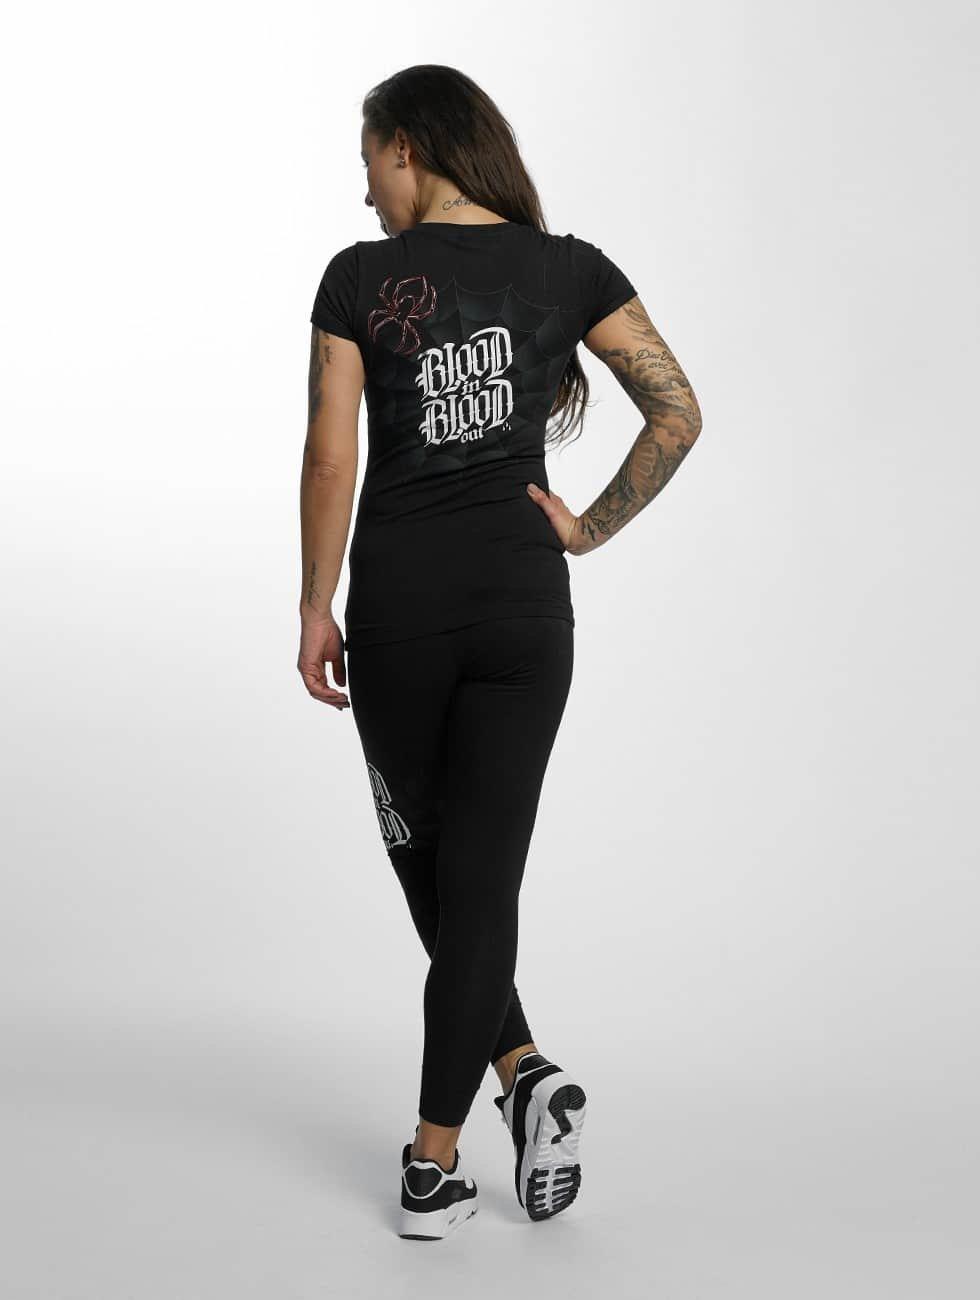 Blood In Blood Out t-shirt Ranio Negro zwart